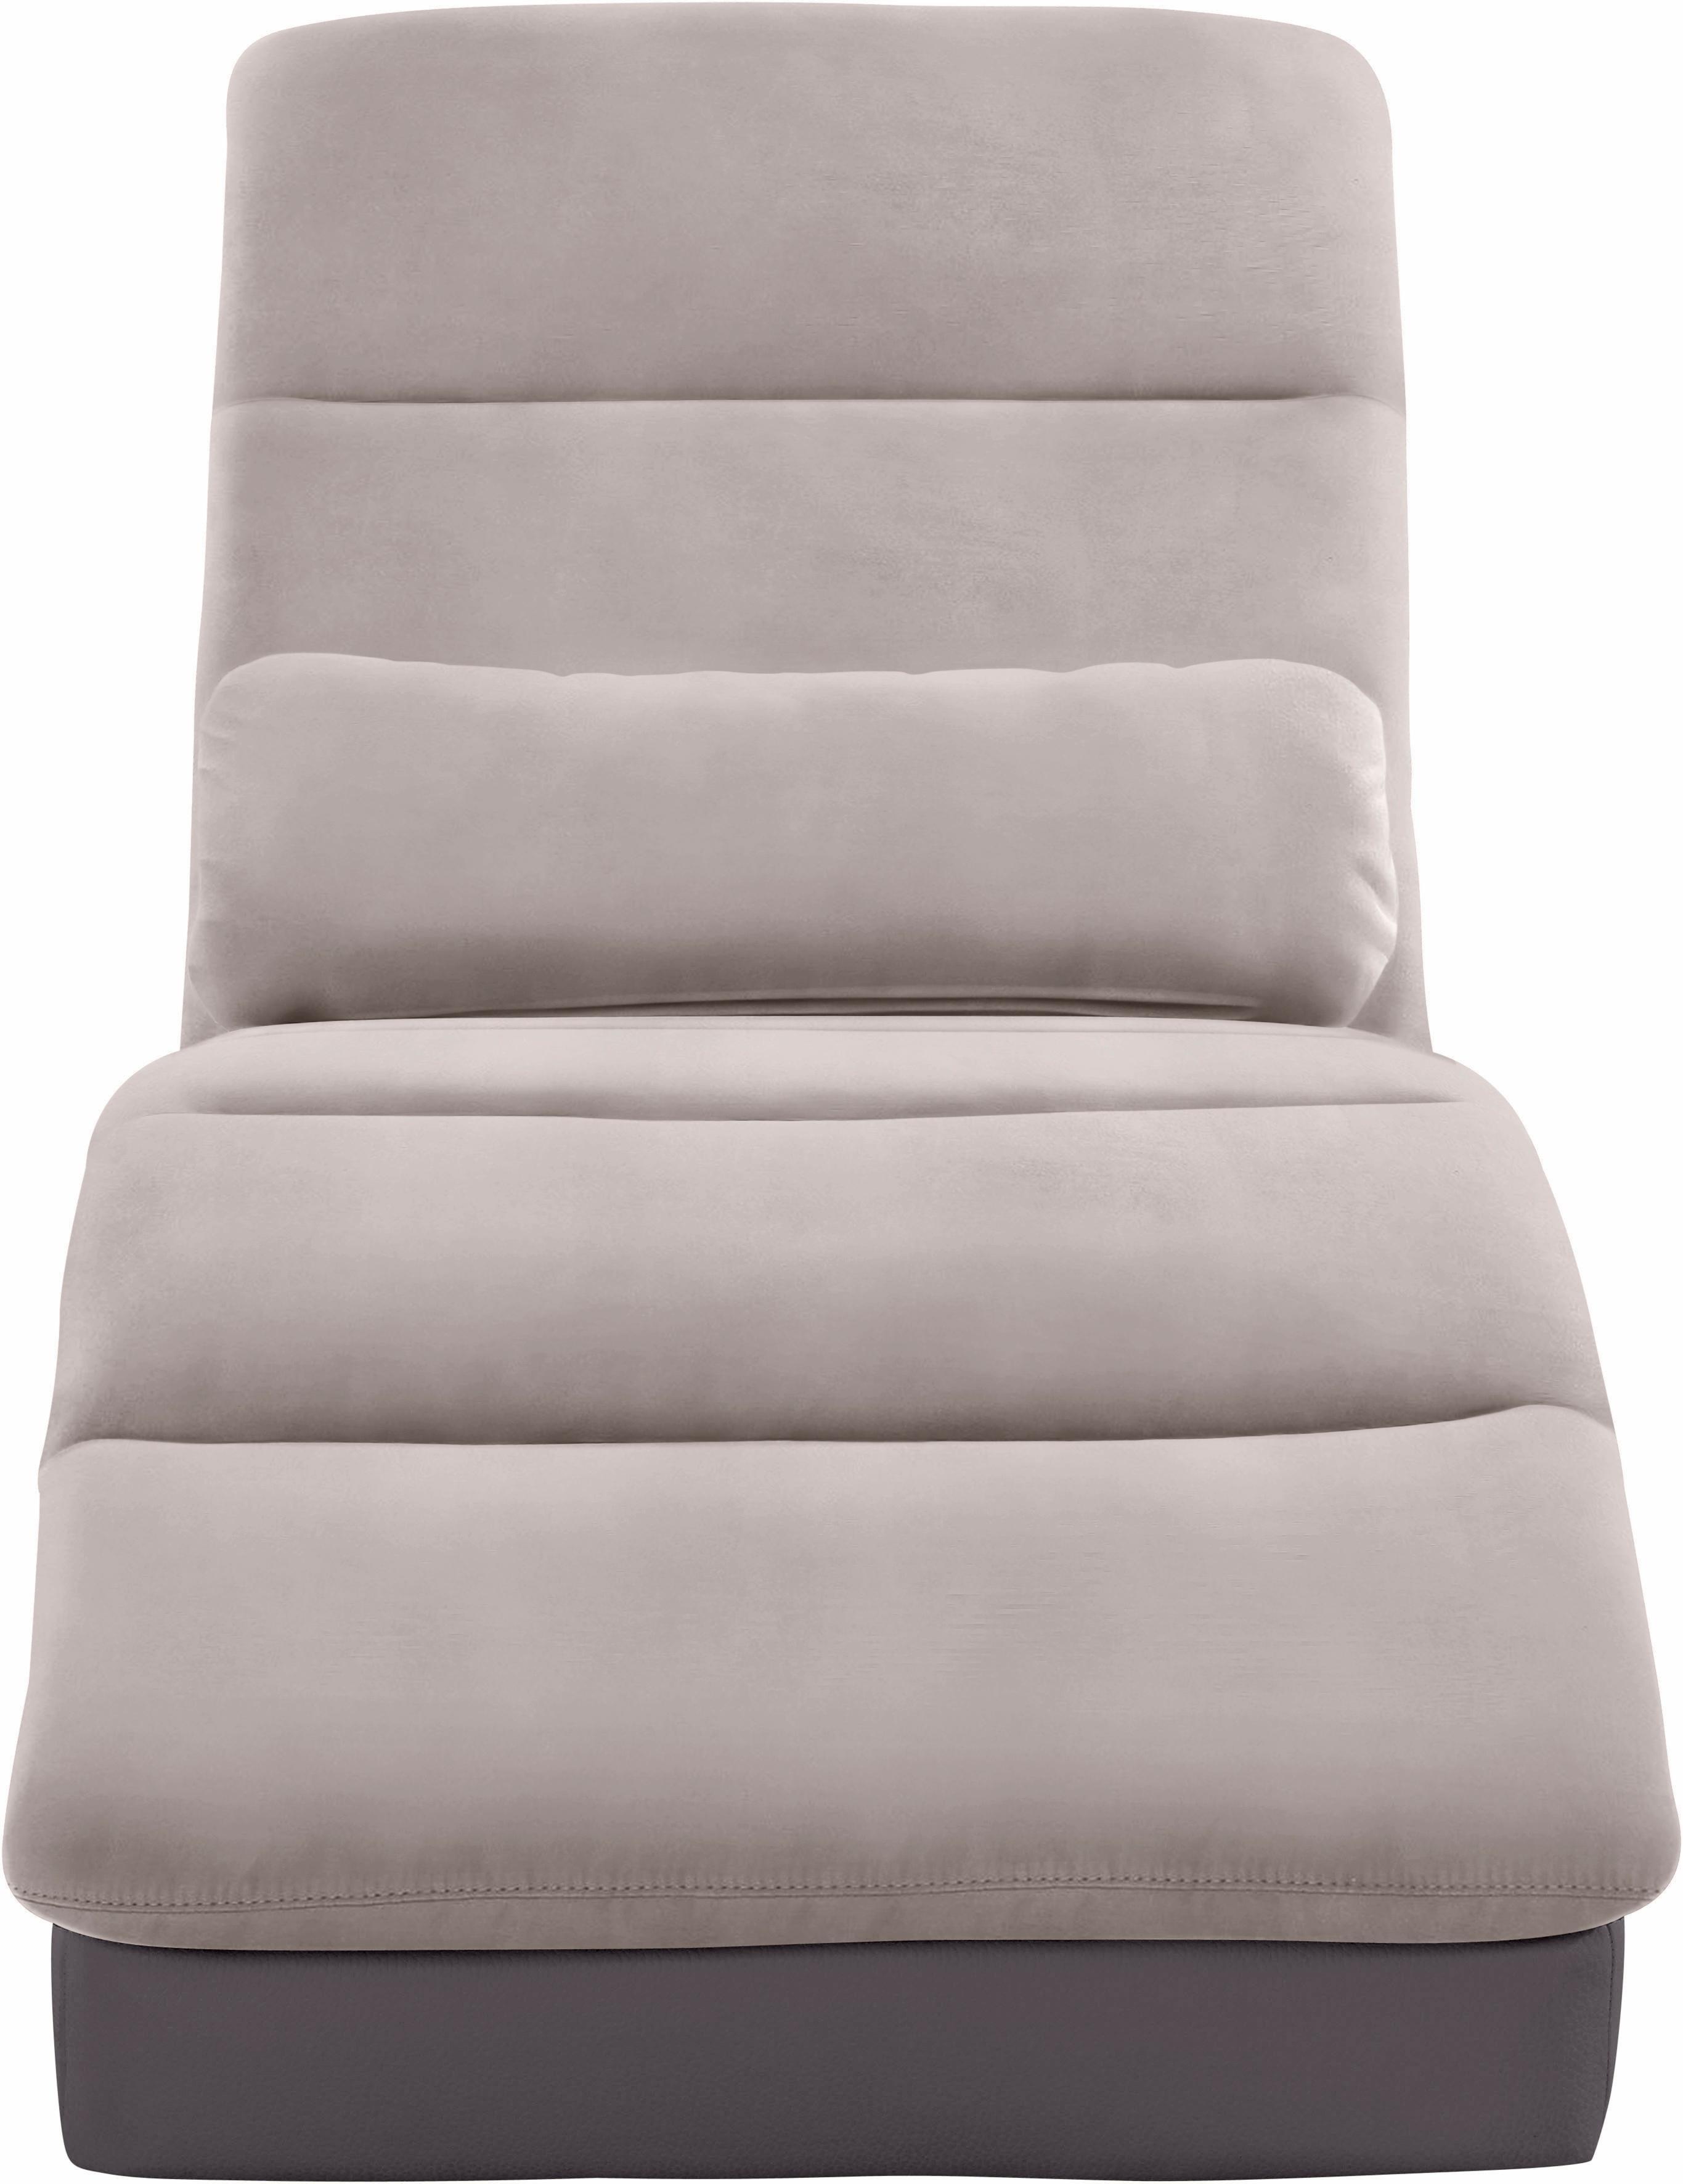 bruno banani ligstoel online verkrijgbaar otto. Black Bedroom Furniture Sets. Home Design Ideas